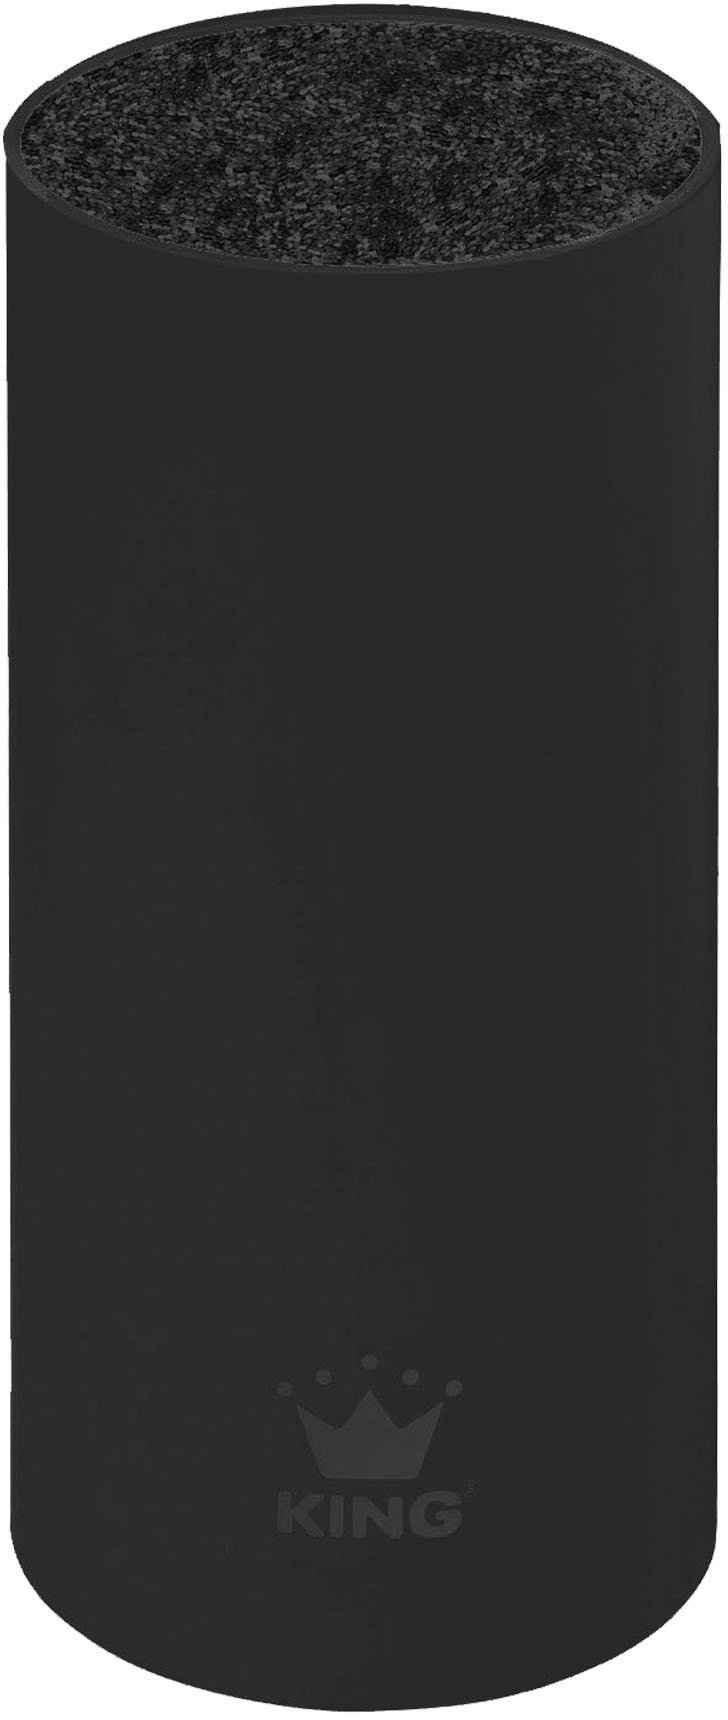 KING Messerblock »soft touch« (1tlg), mit rutschhemmender Oberfläche